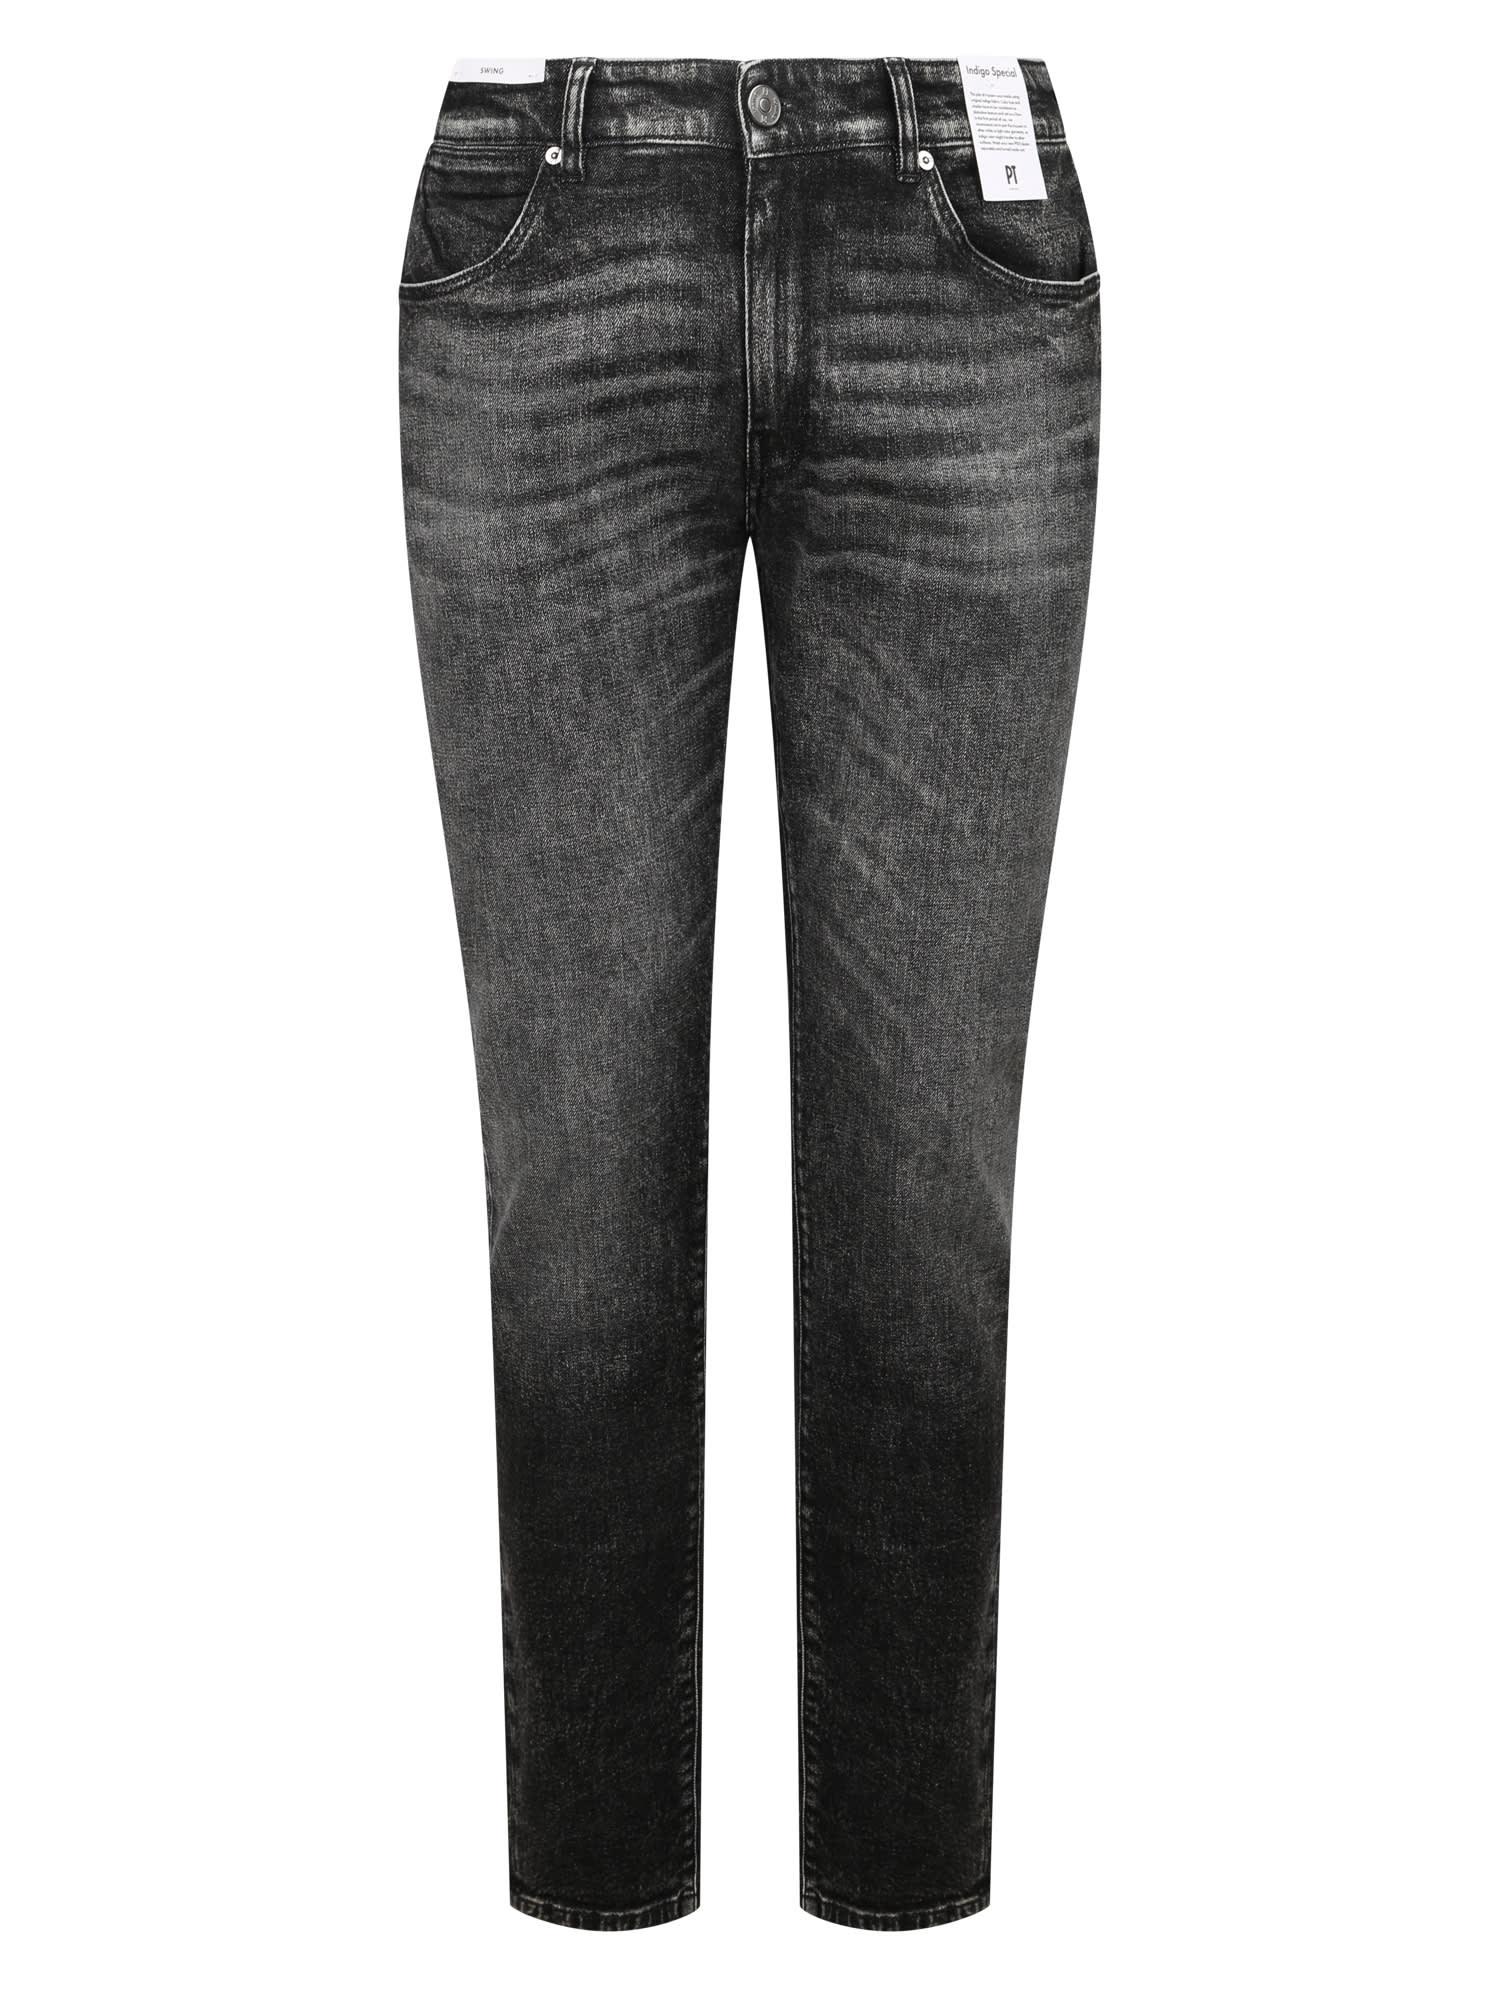 Pt01 Jeans Stretch Vintage Nero In Black